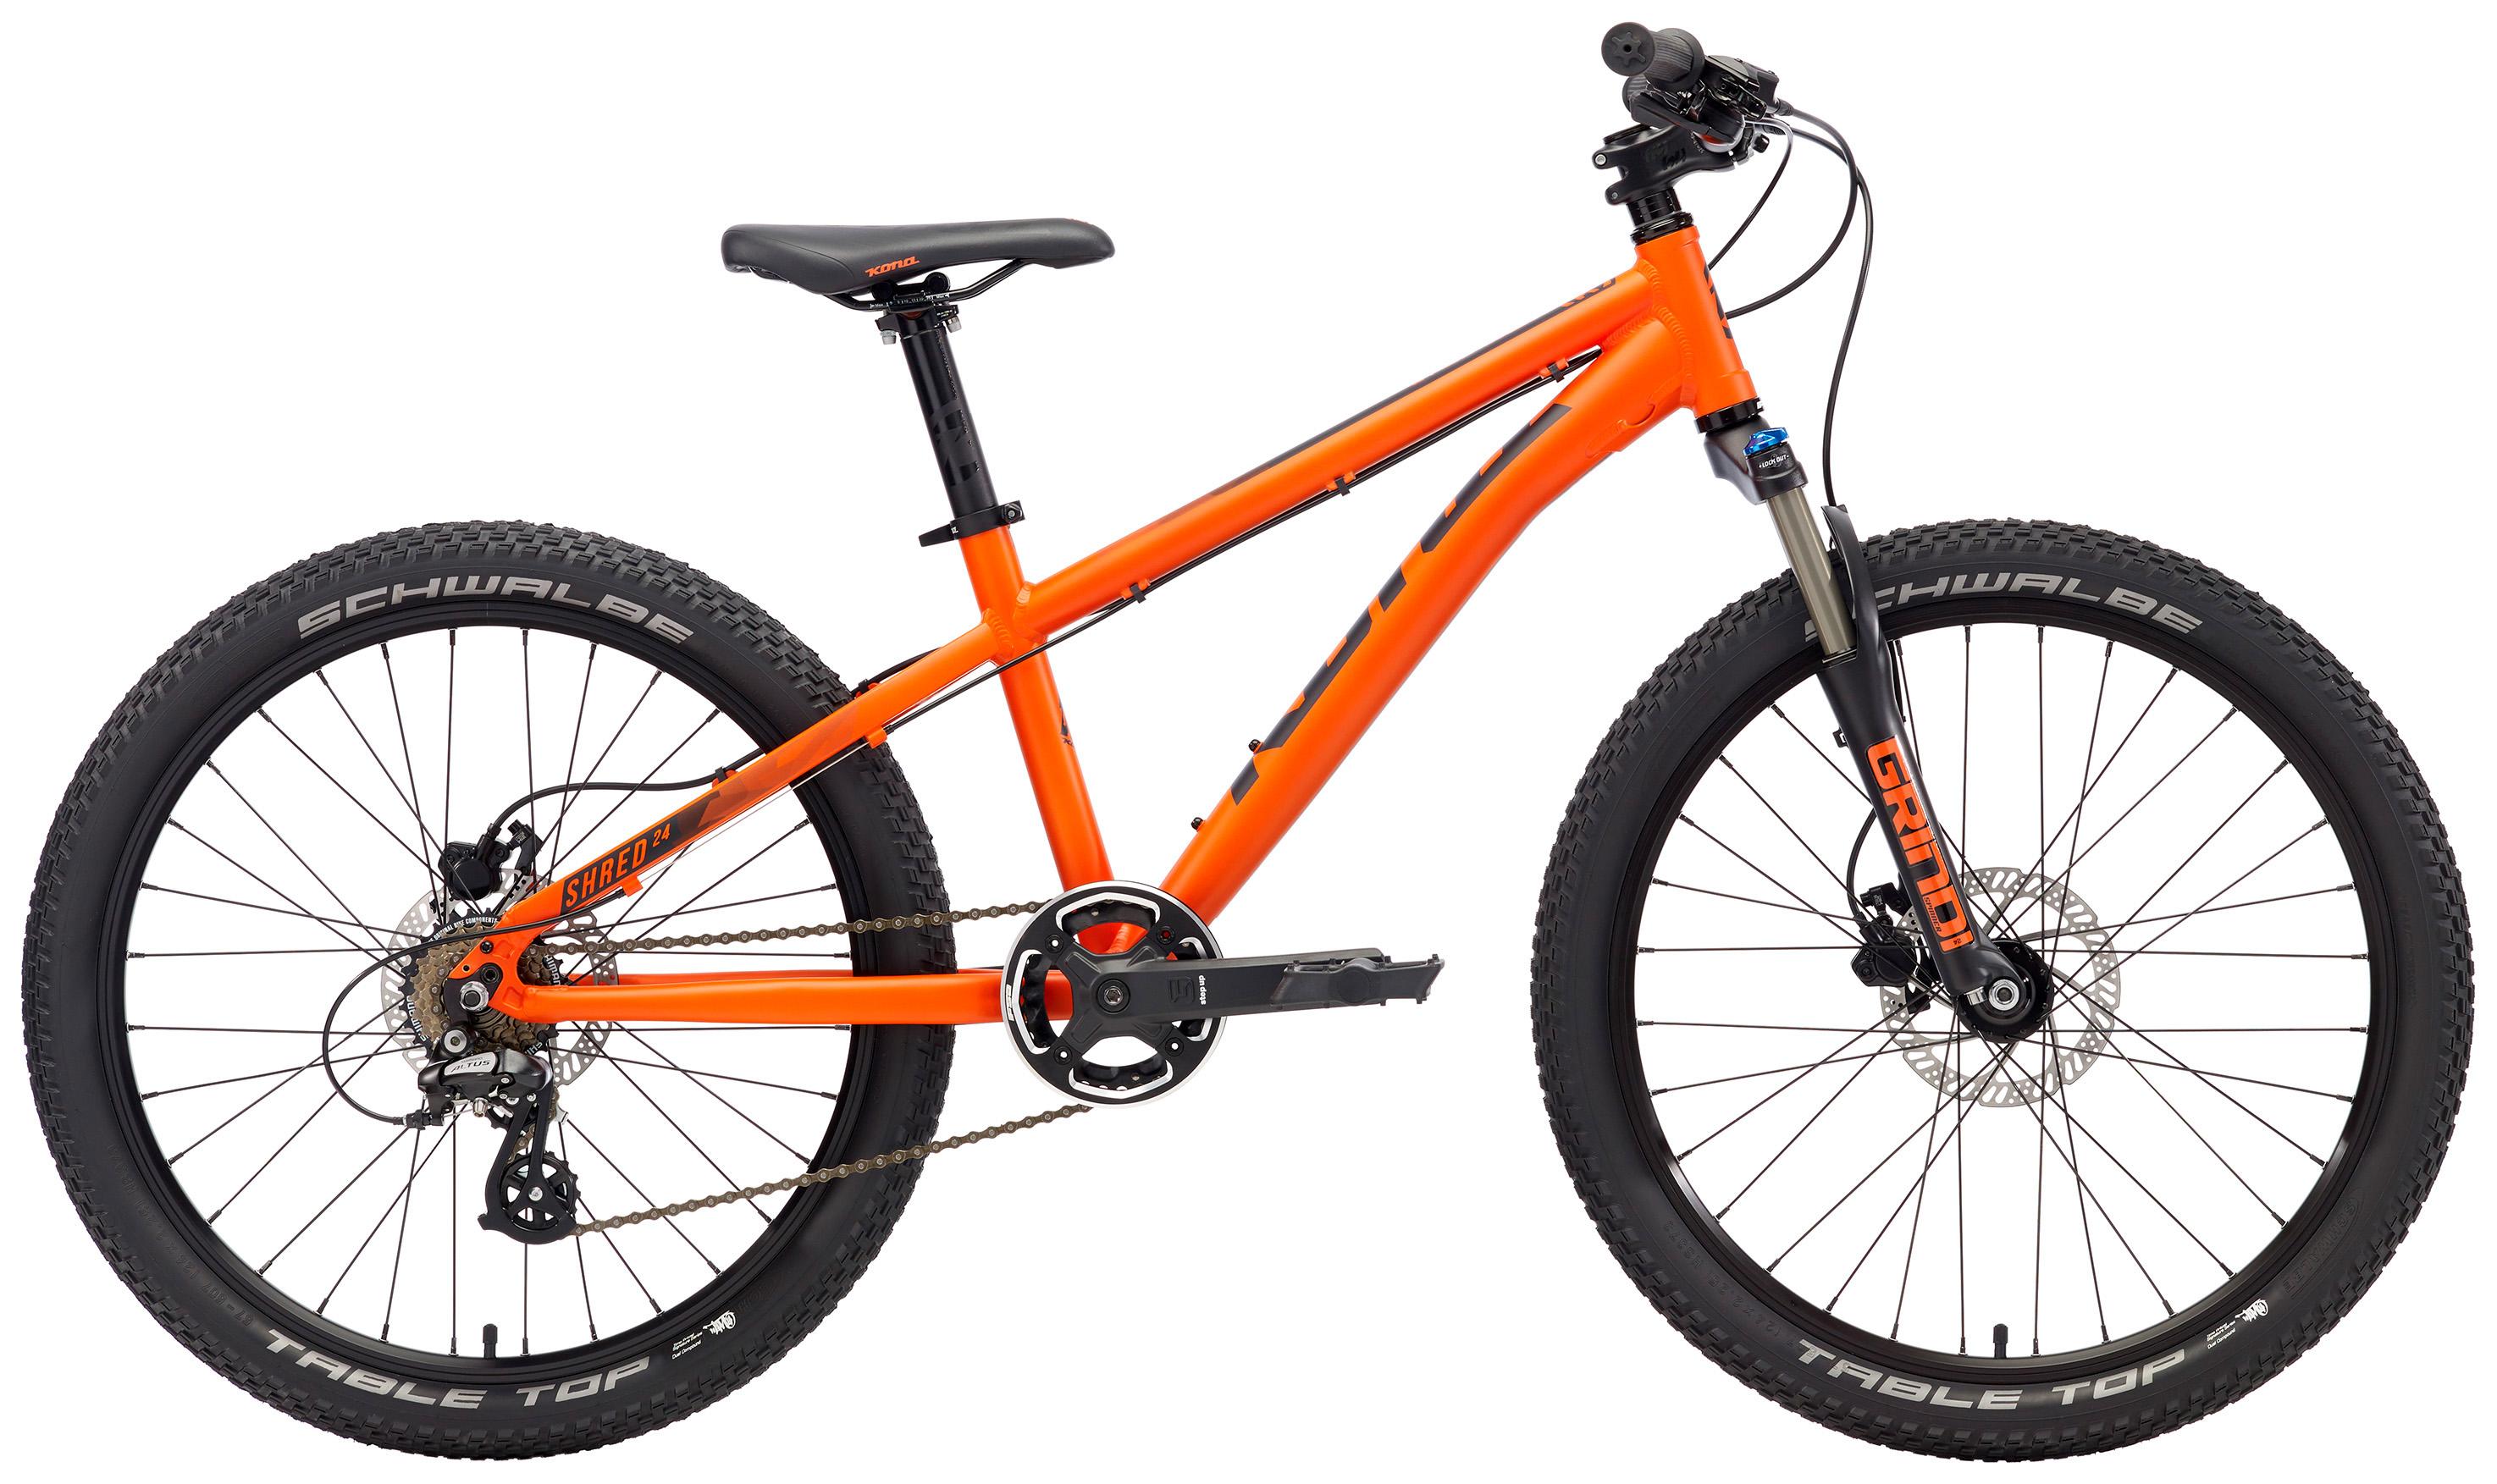 Image of a Pivot Firebird mountain bike for sale available at Bike Depot  Toronto